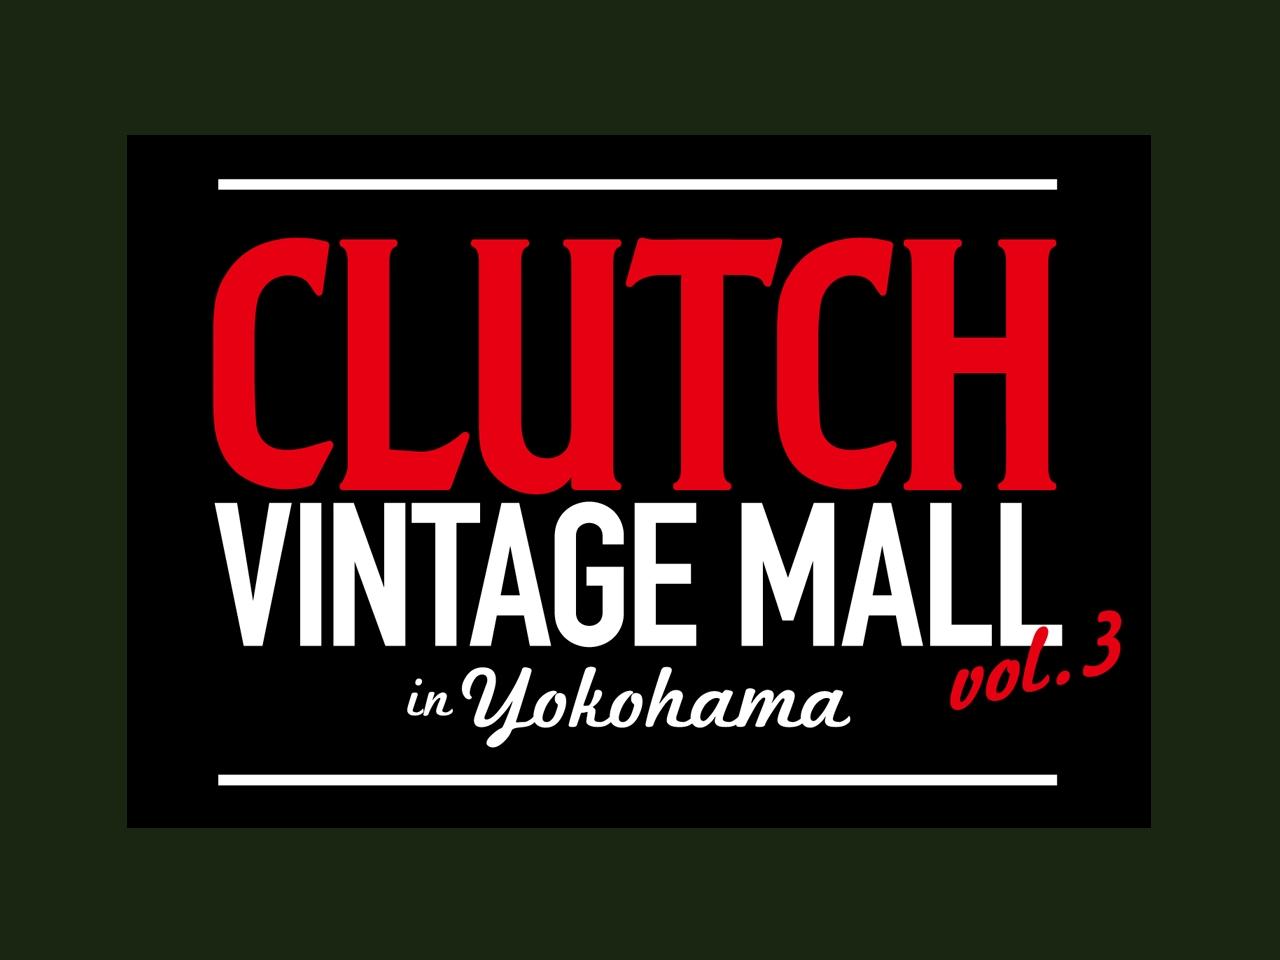 CLUTCH VINTAGE MALL in yokohama Vol.3 開催!